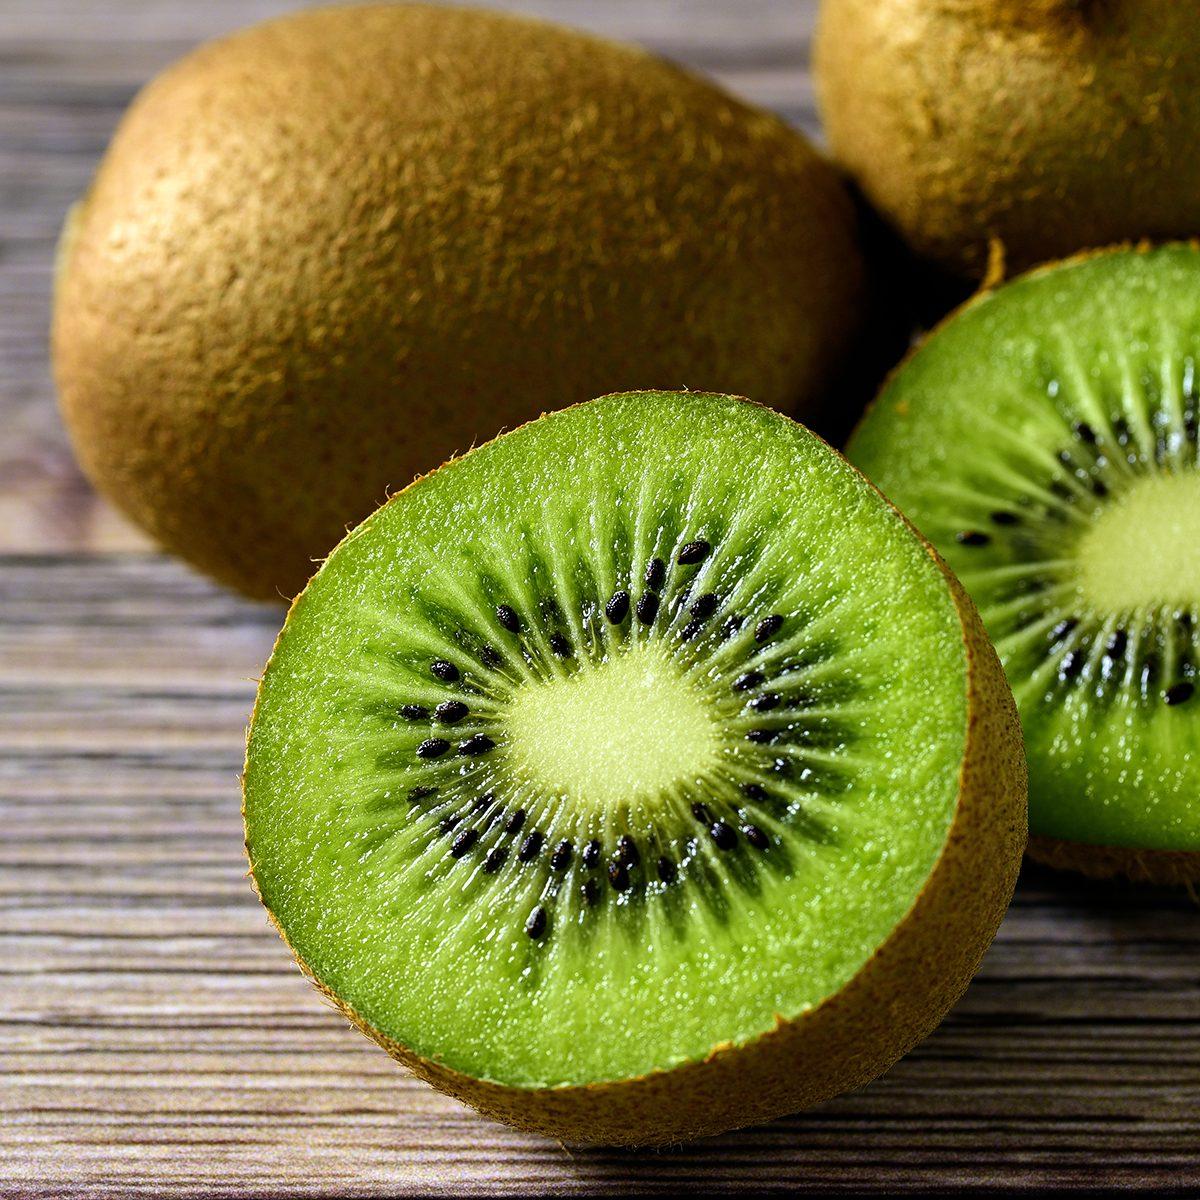 fruits for diabetics Sliced fresh kiwi fruit on wood table